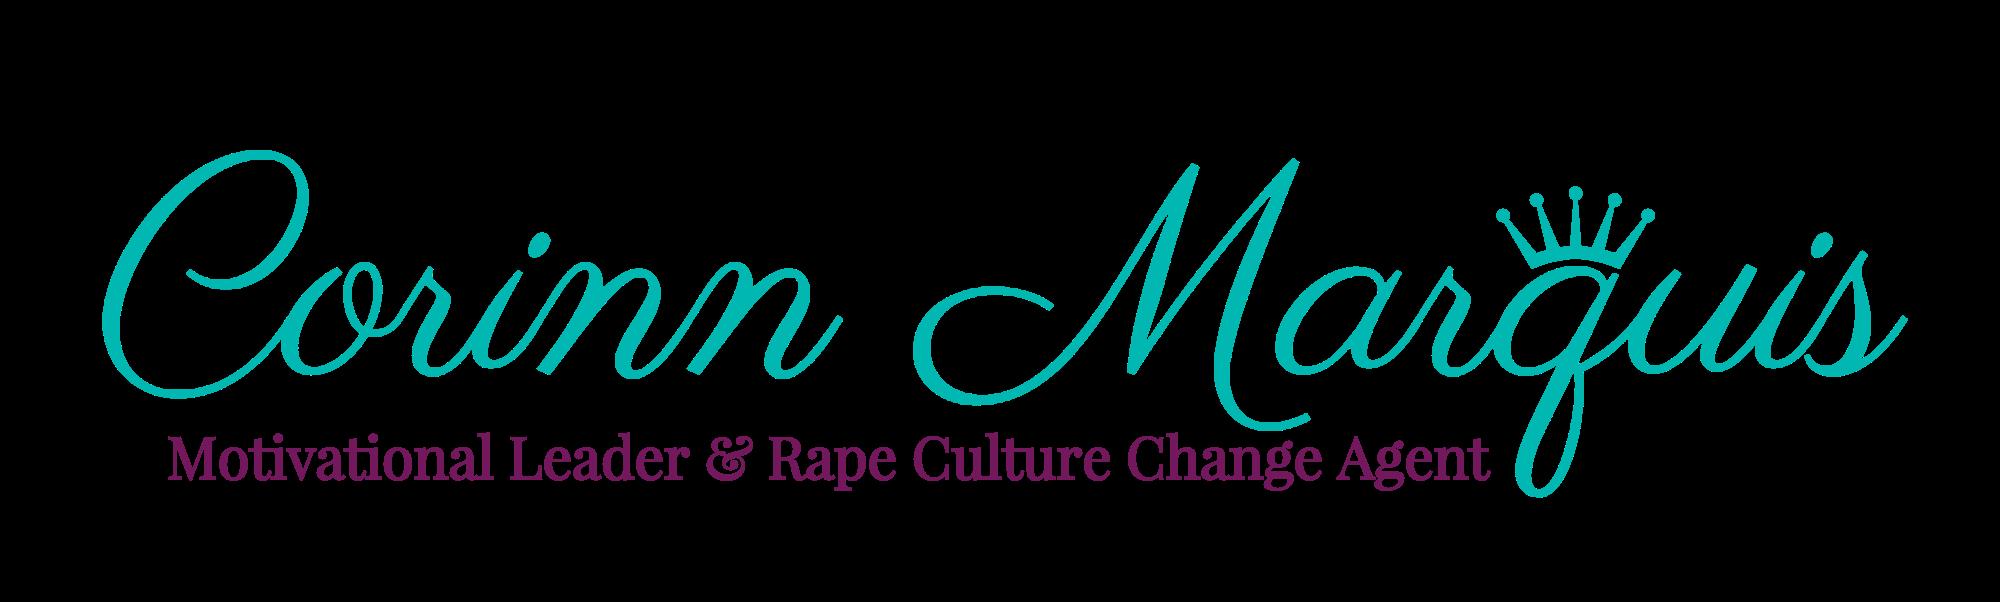 Corinn Marquis-logo (3).png